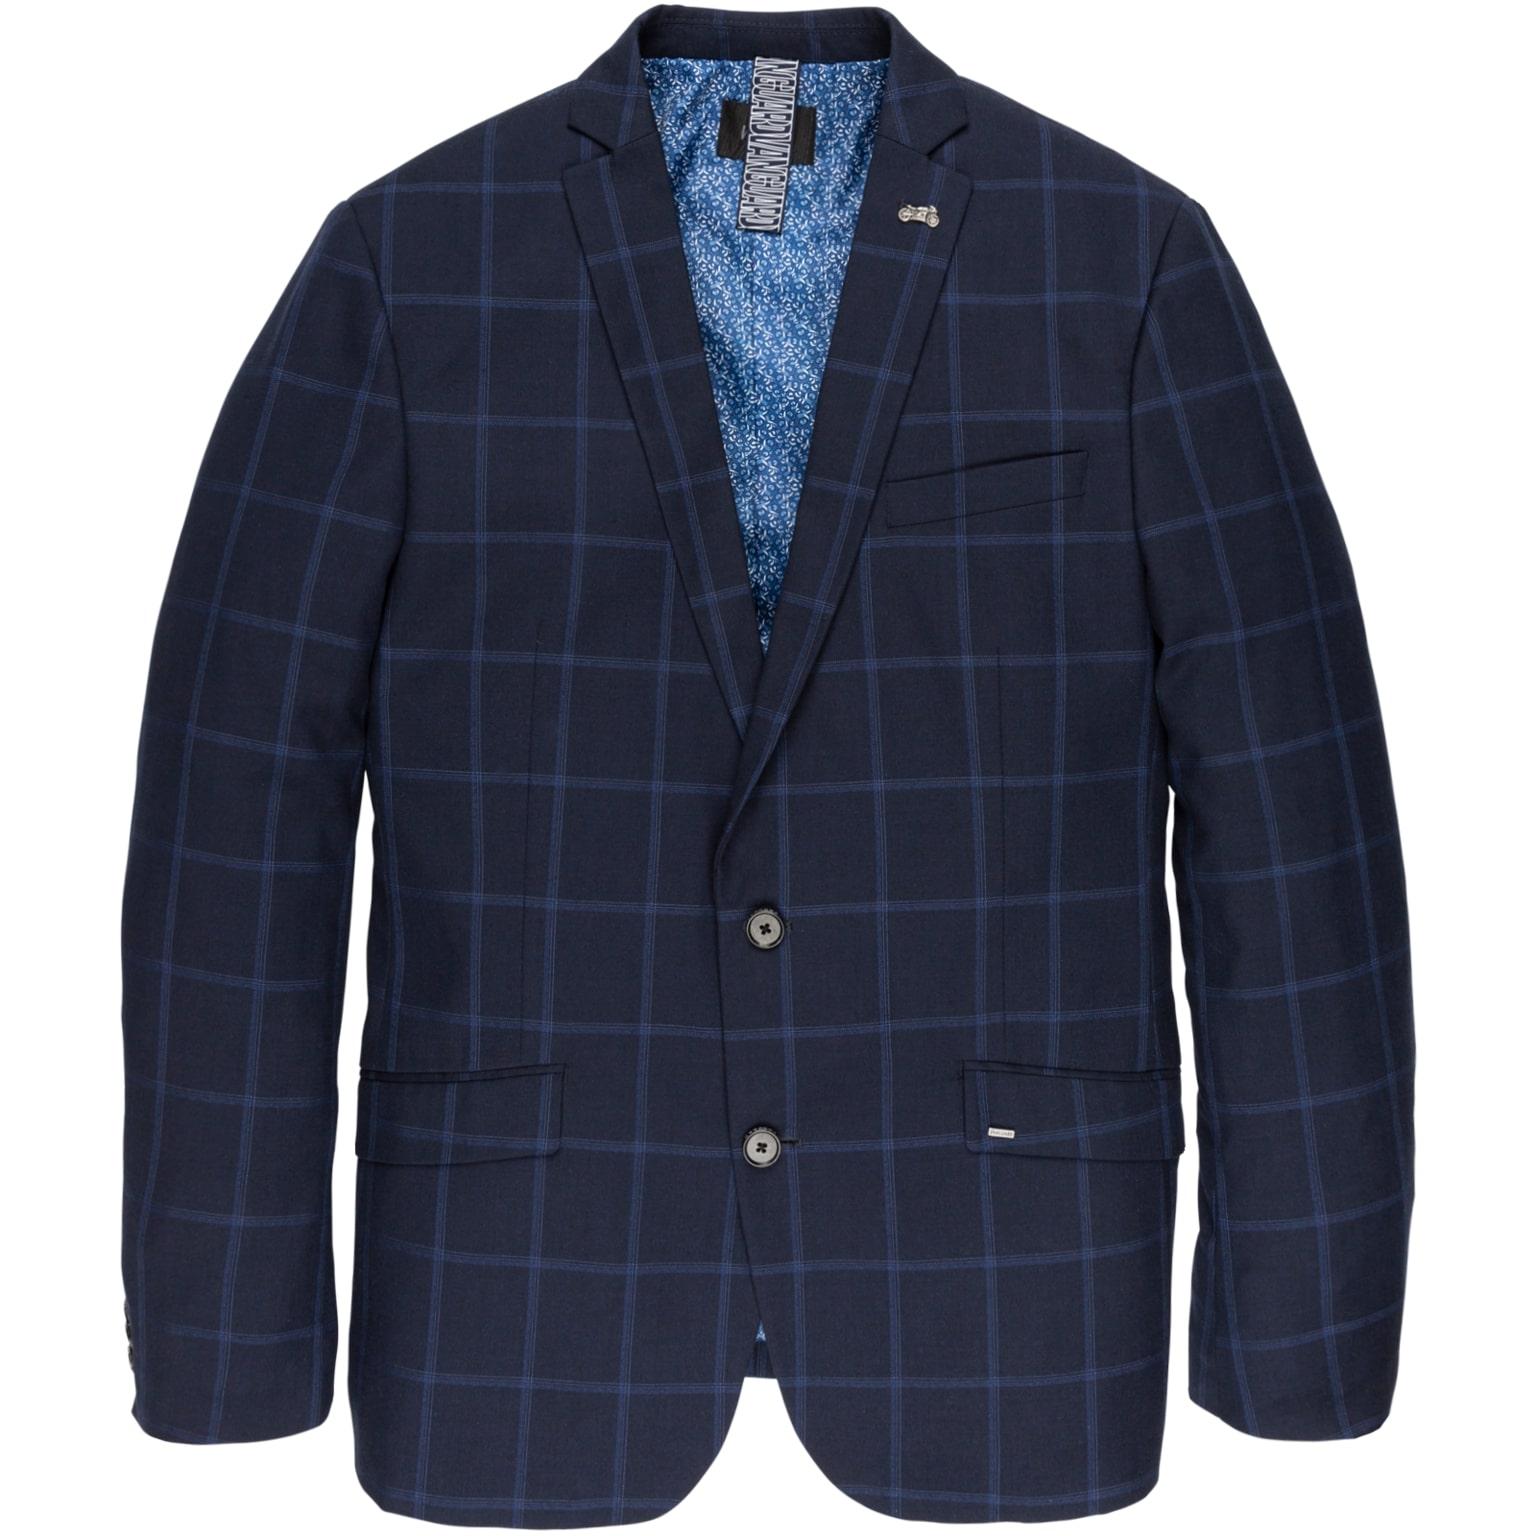 Donkerblauwe heren blazer Vanguard - VBL201159 5286